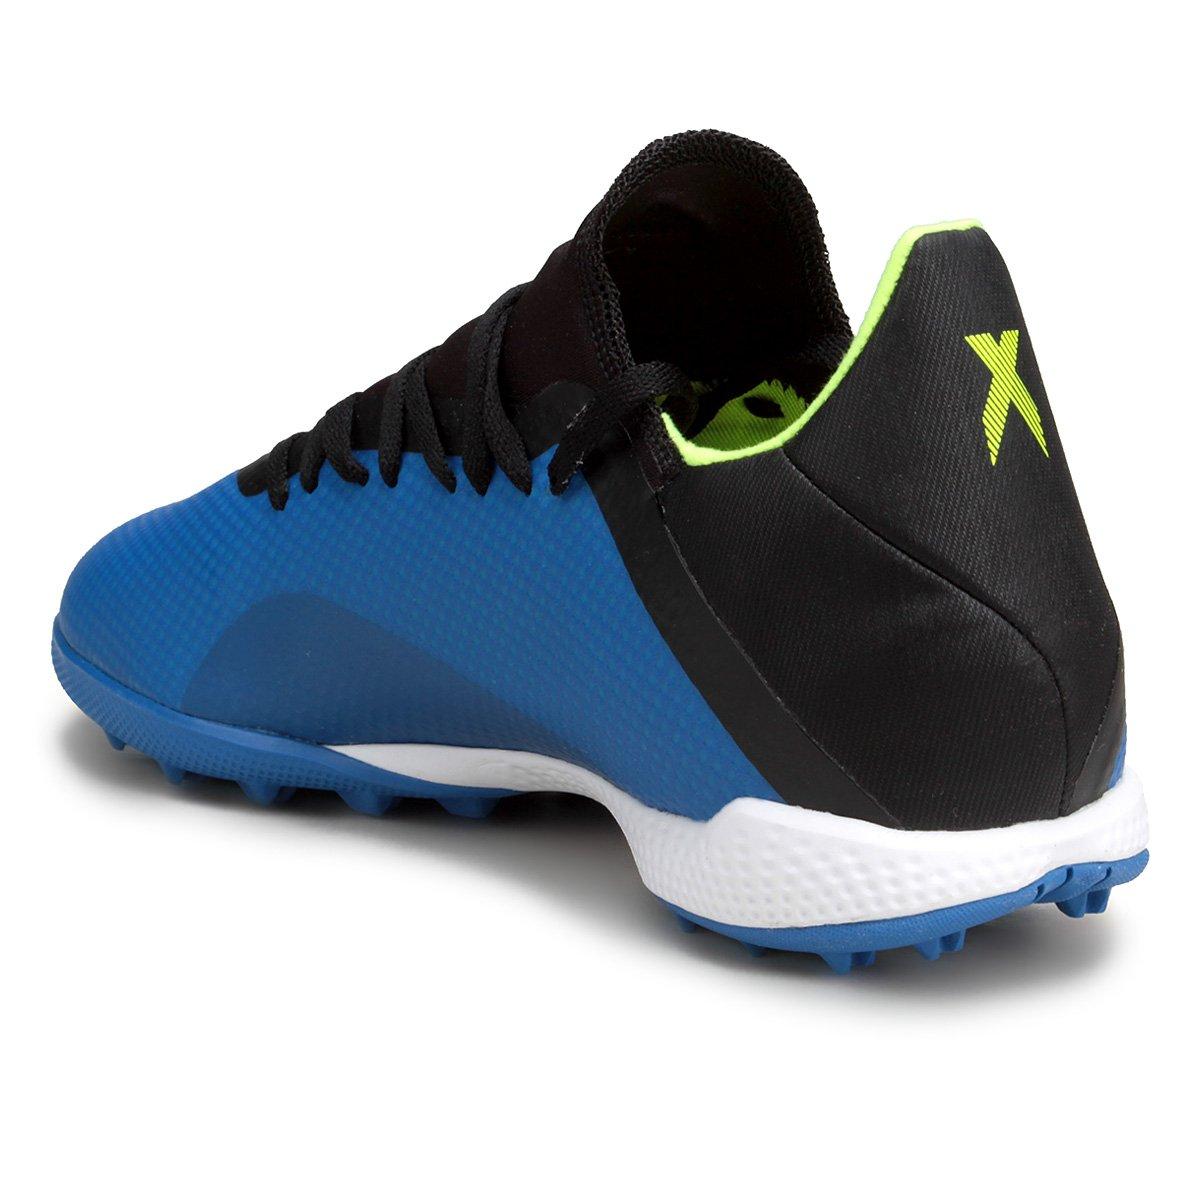 62786488a7 ... Adidas Society TF Masculina 18 e Chuteira X 3 Azul Preto Tango U4cqa ...